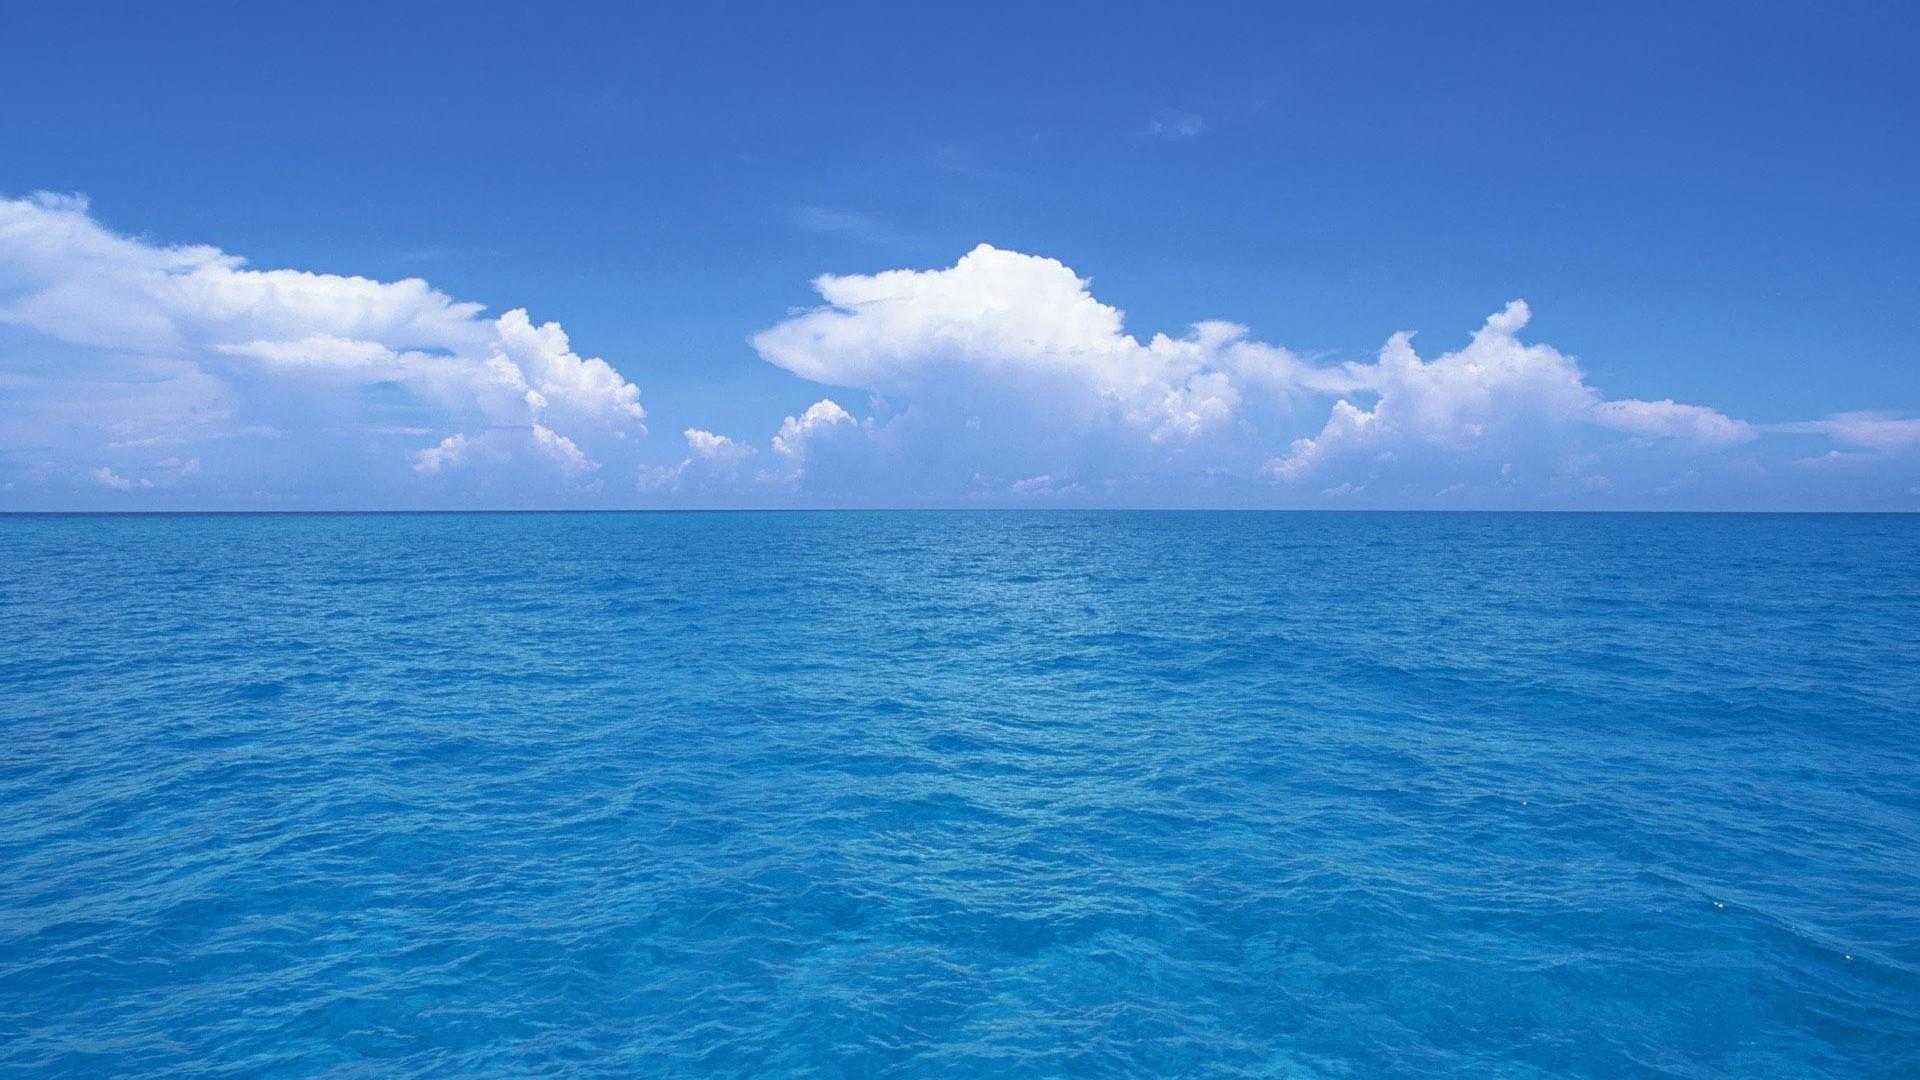 blue ocean clouds skylines sea wallpaper background